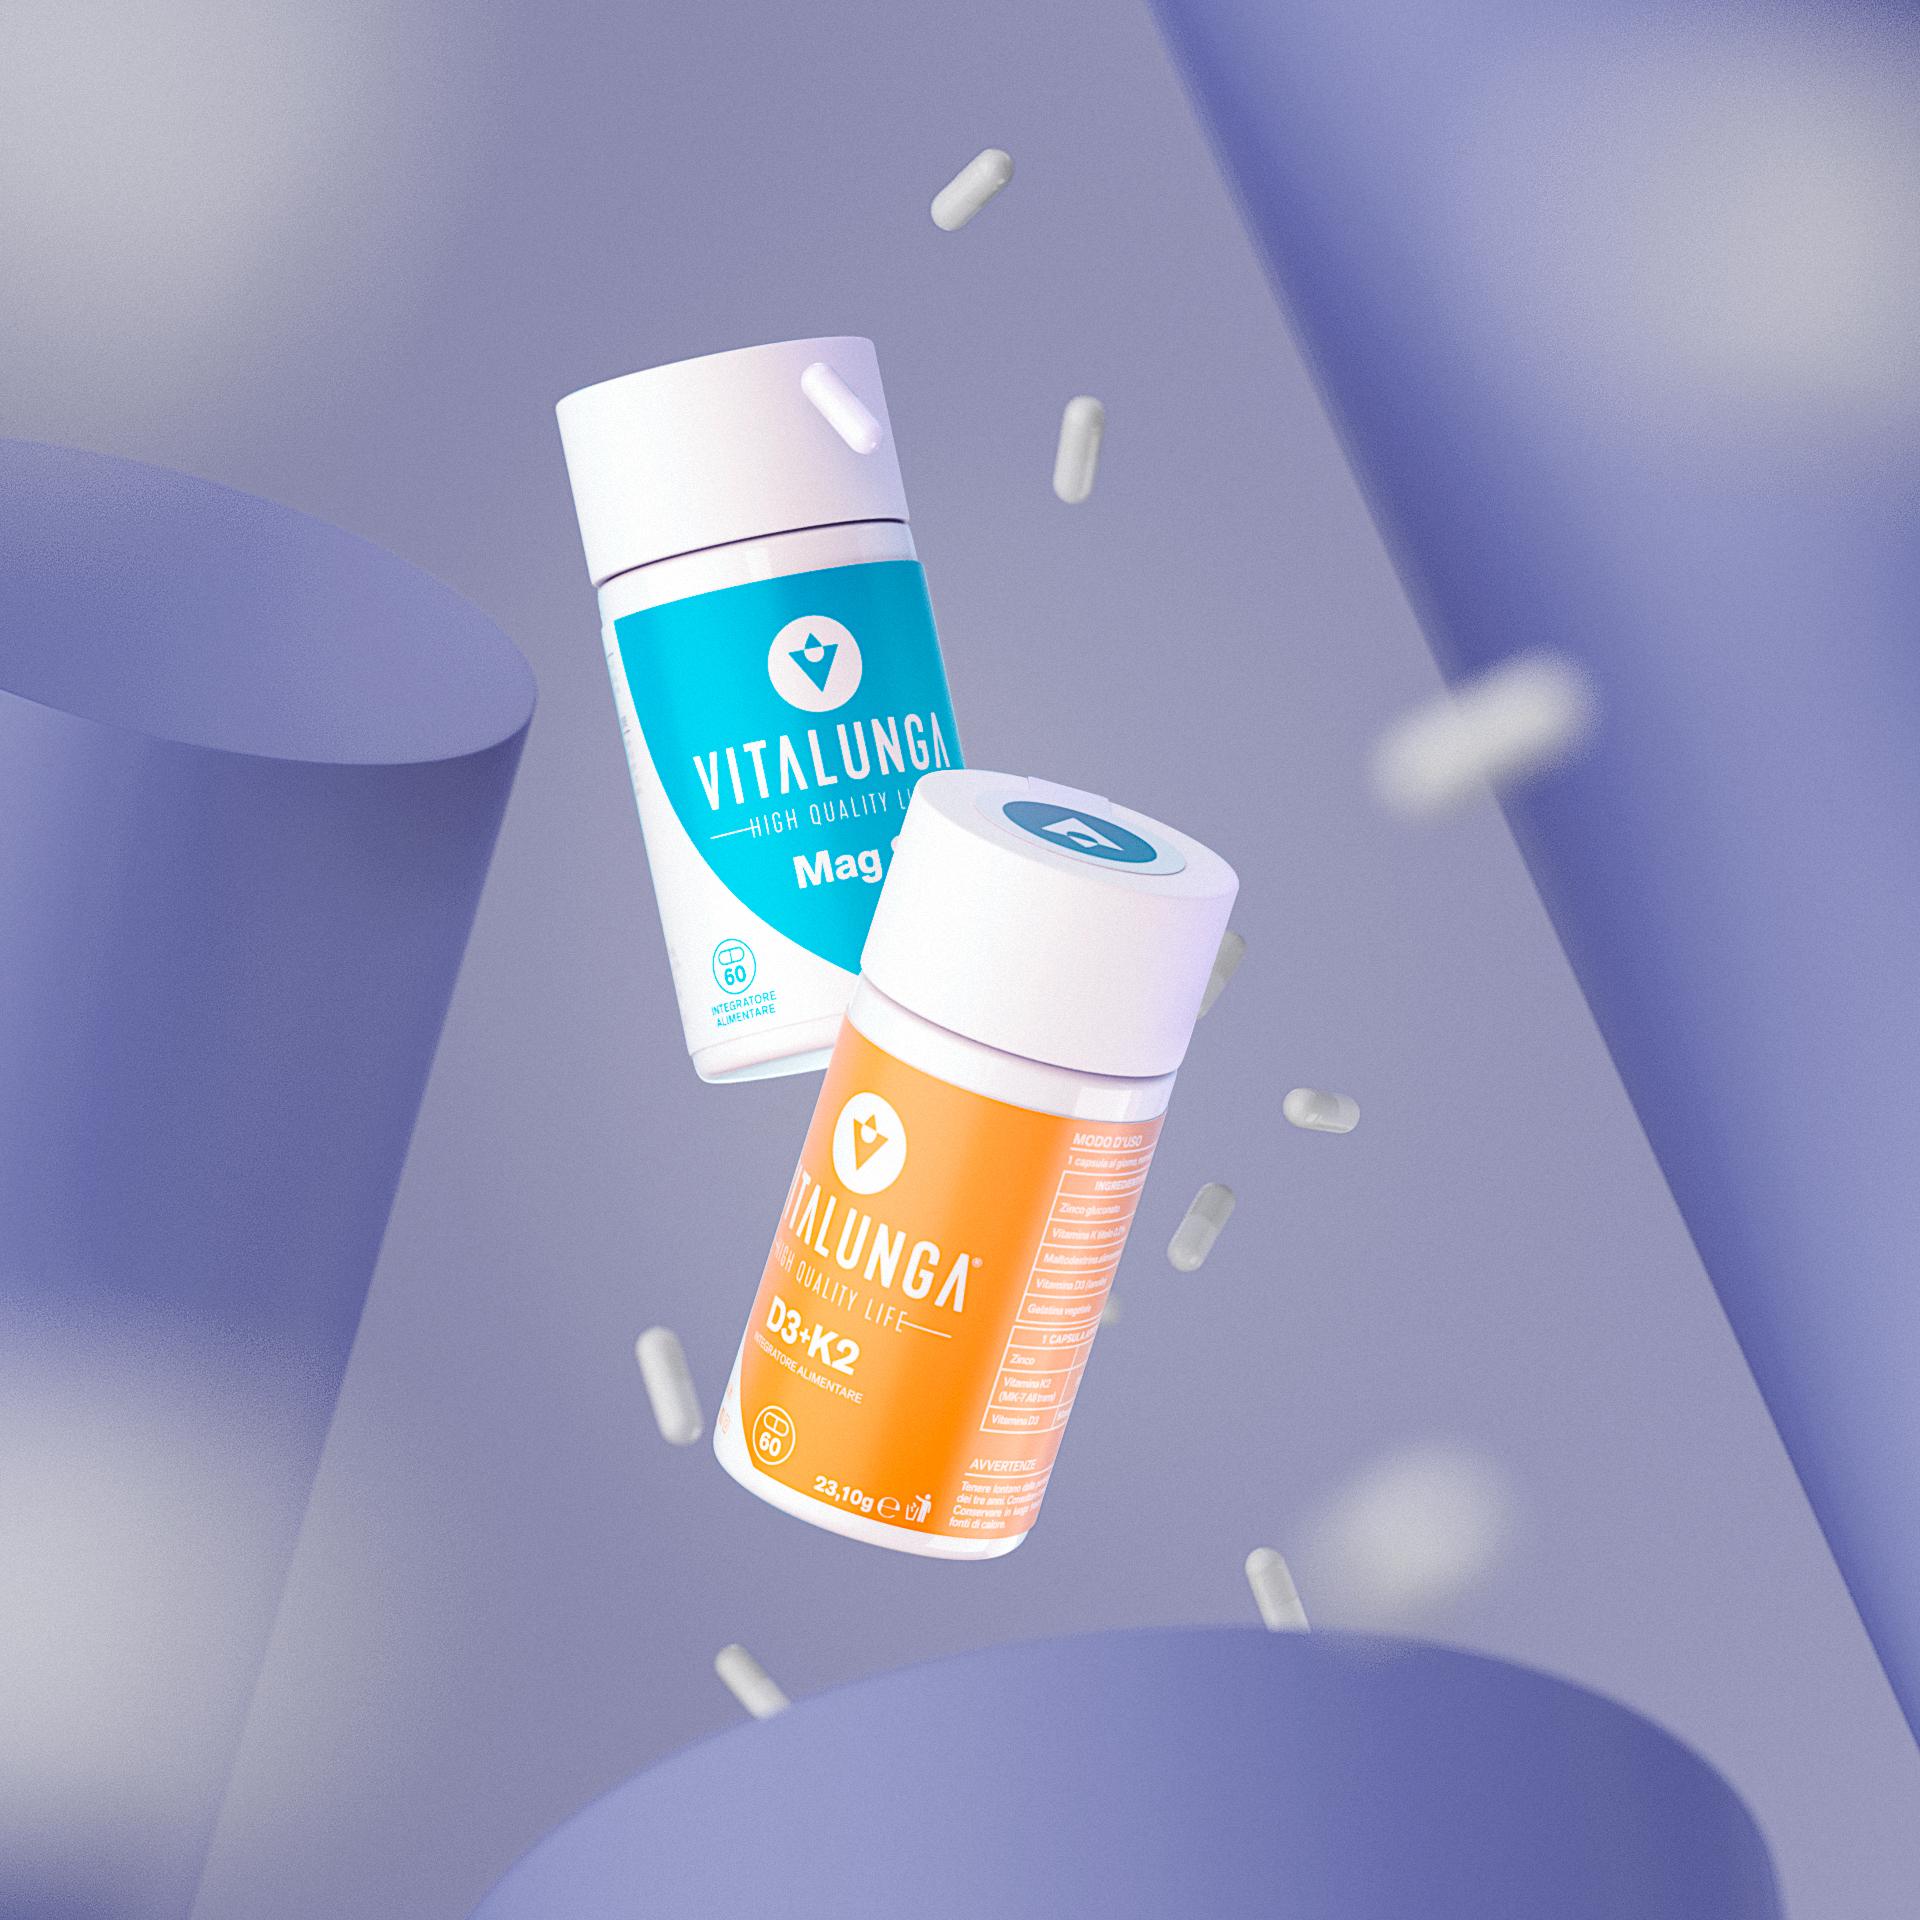 vitalungarender packaging